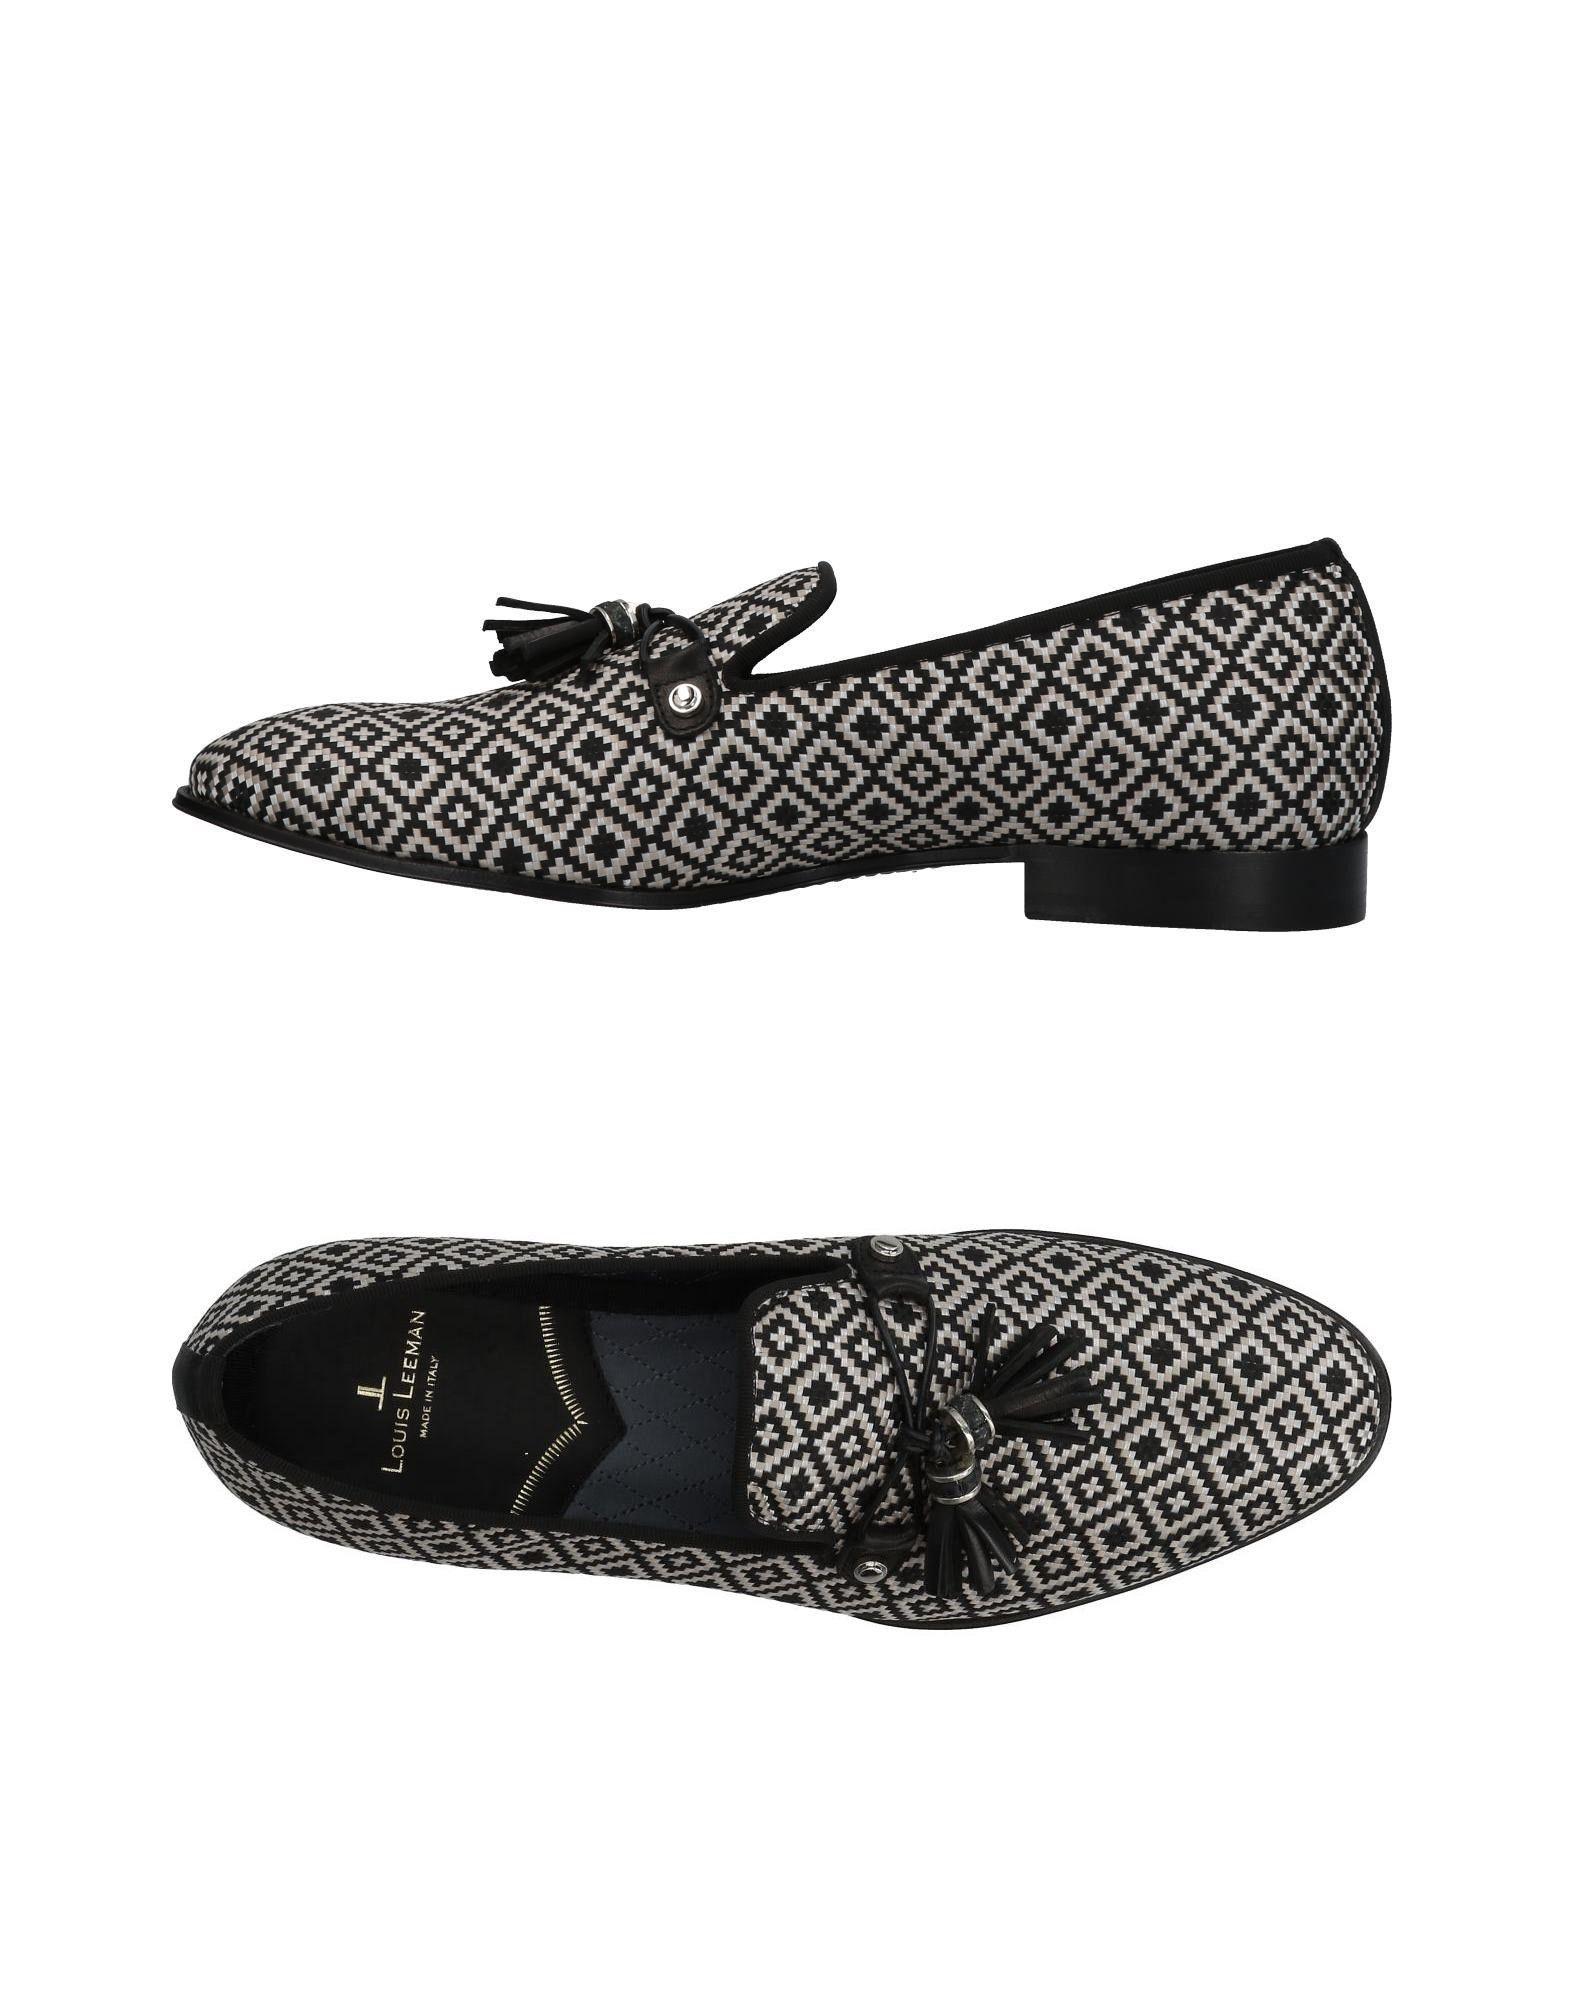 Louis Leeman Mokassins Herren  11418144PB Gute Qualität beliebte Schuhe